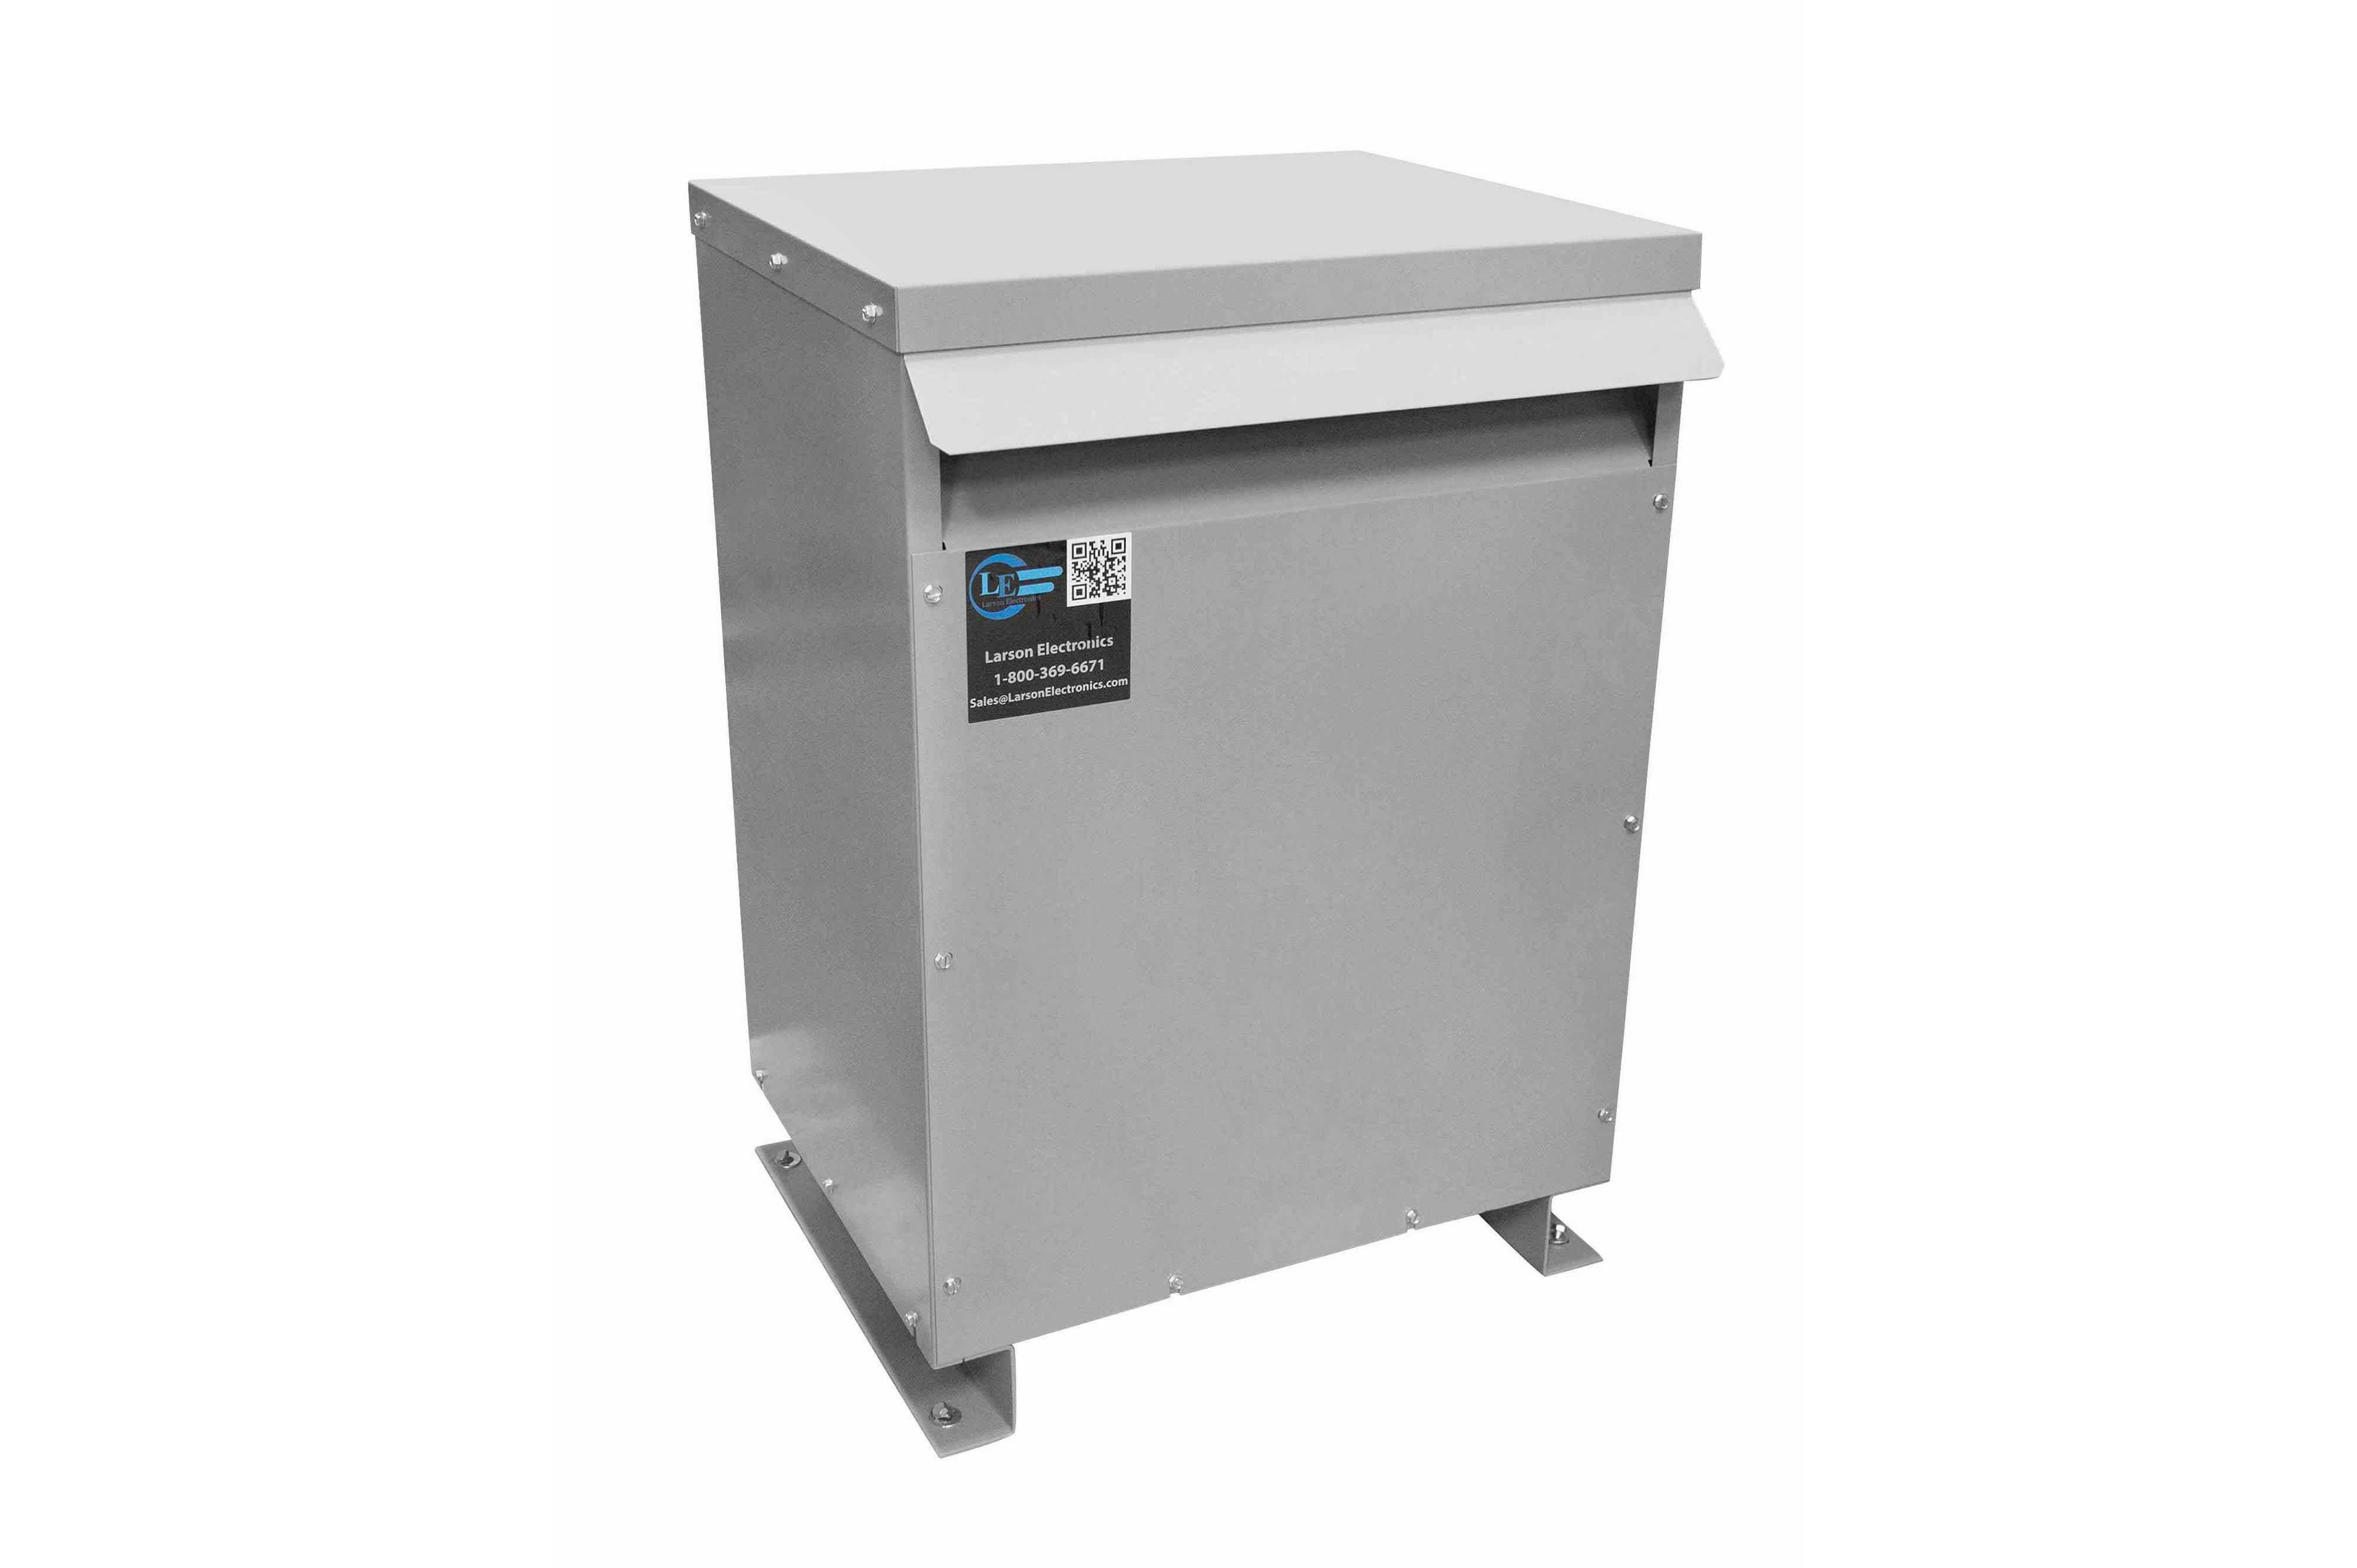 300 kVA 3PH Isolation Transformer, 400V Wye Primary, 240V Delta Secondary, N3R, Ventilated, 60 Hz